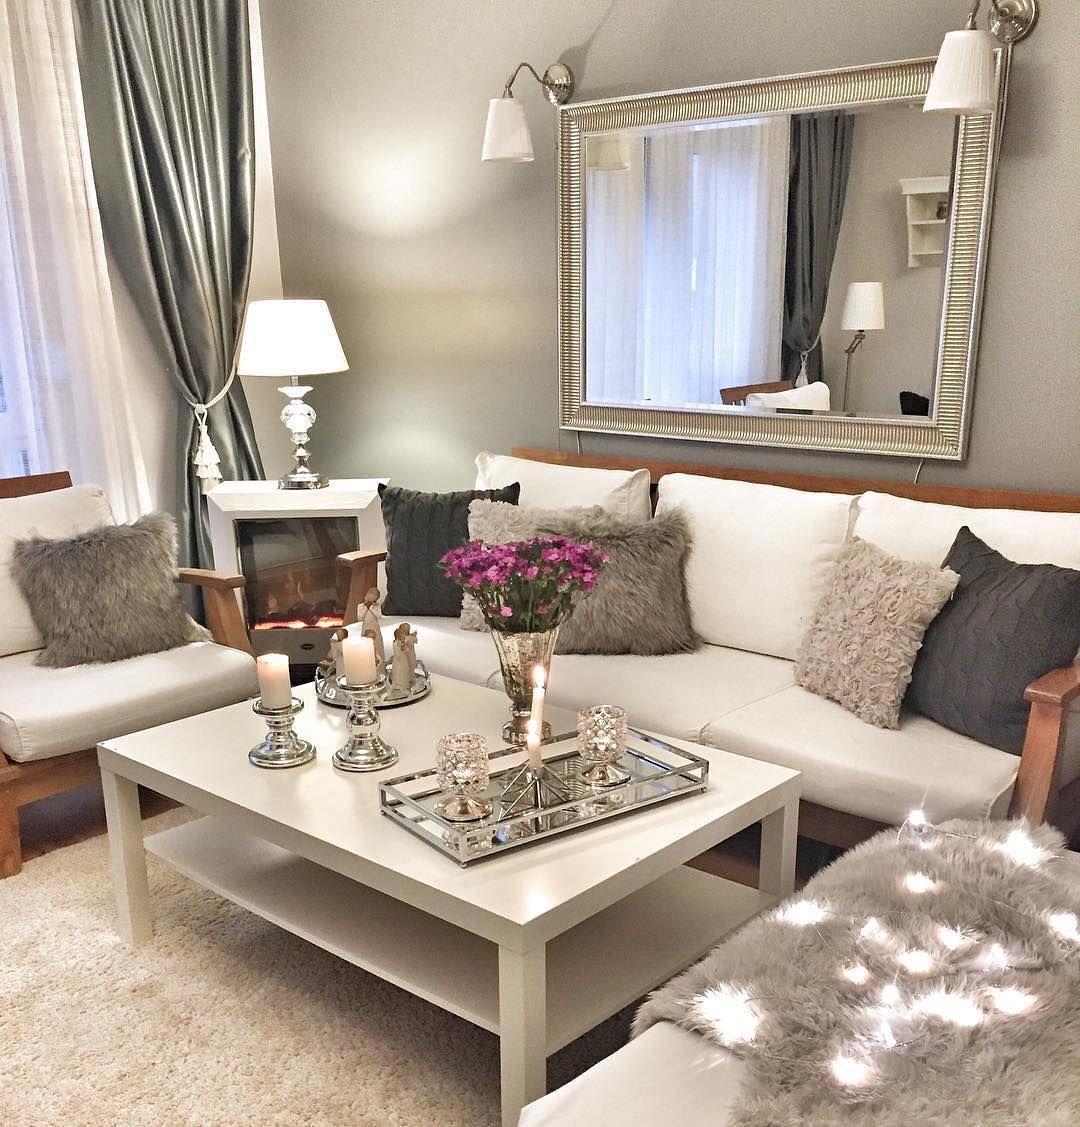 3 271 Likes 37 Comments مجالس مطابخ Decor Decor M M On Instagram ديكور Living Room Decor Modern Dressing Room Design Small Living Rooms